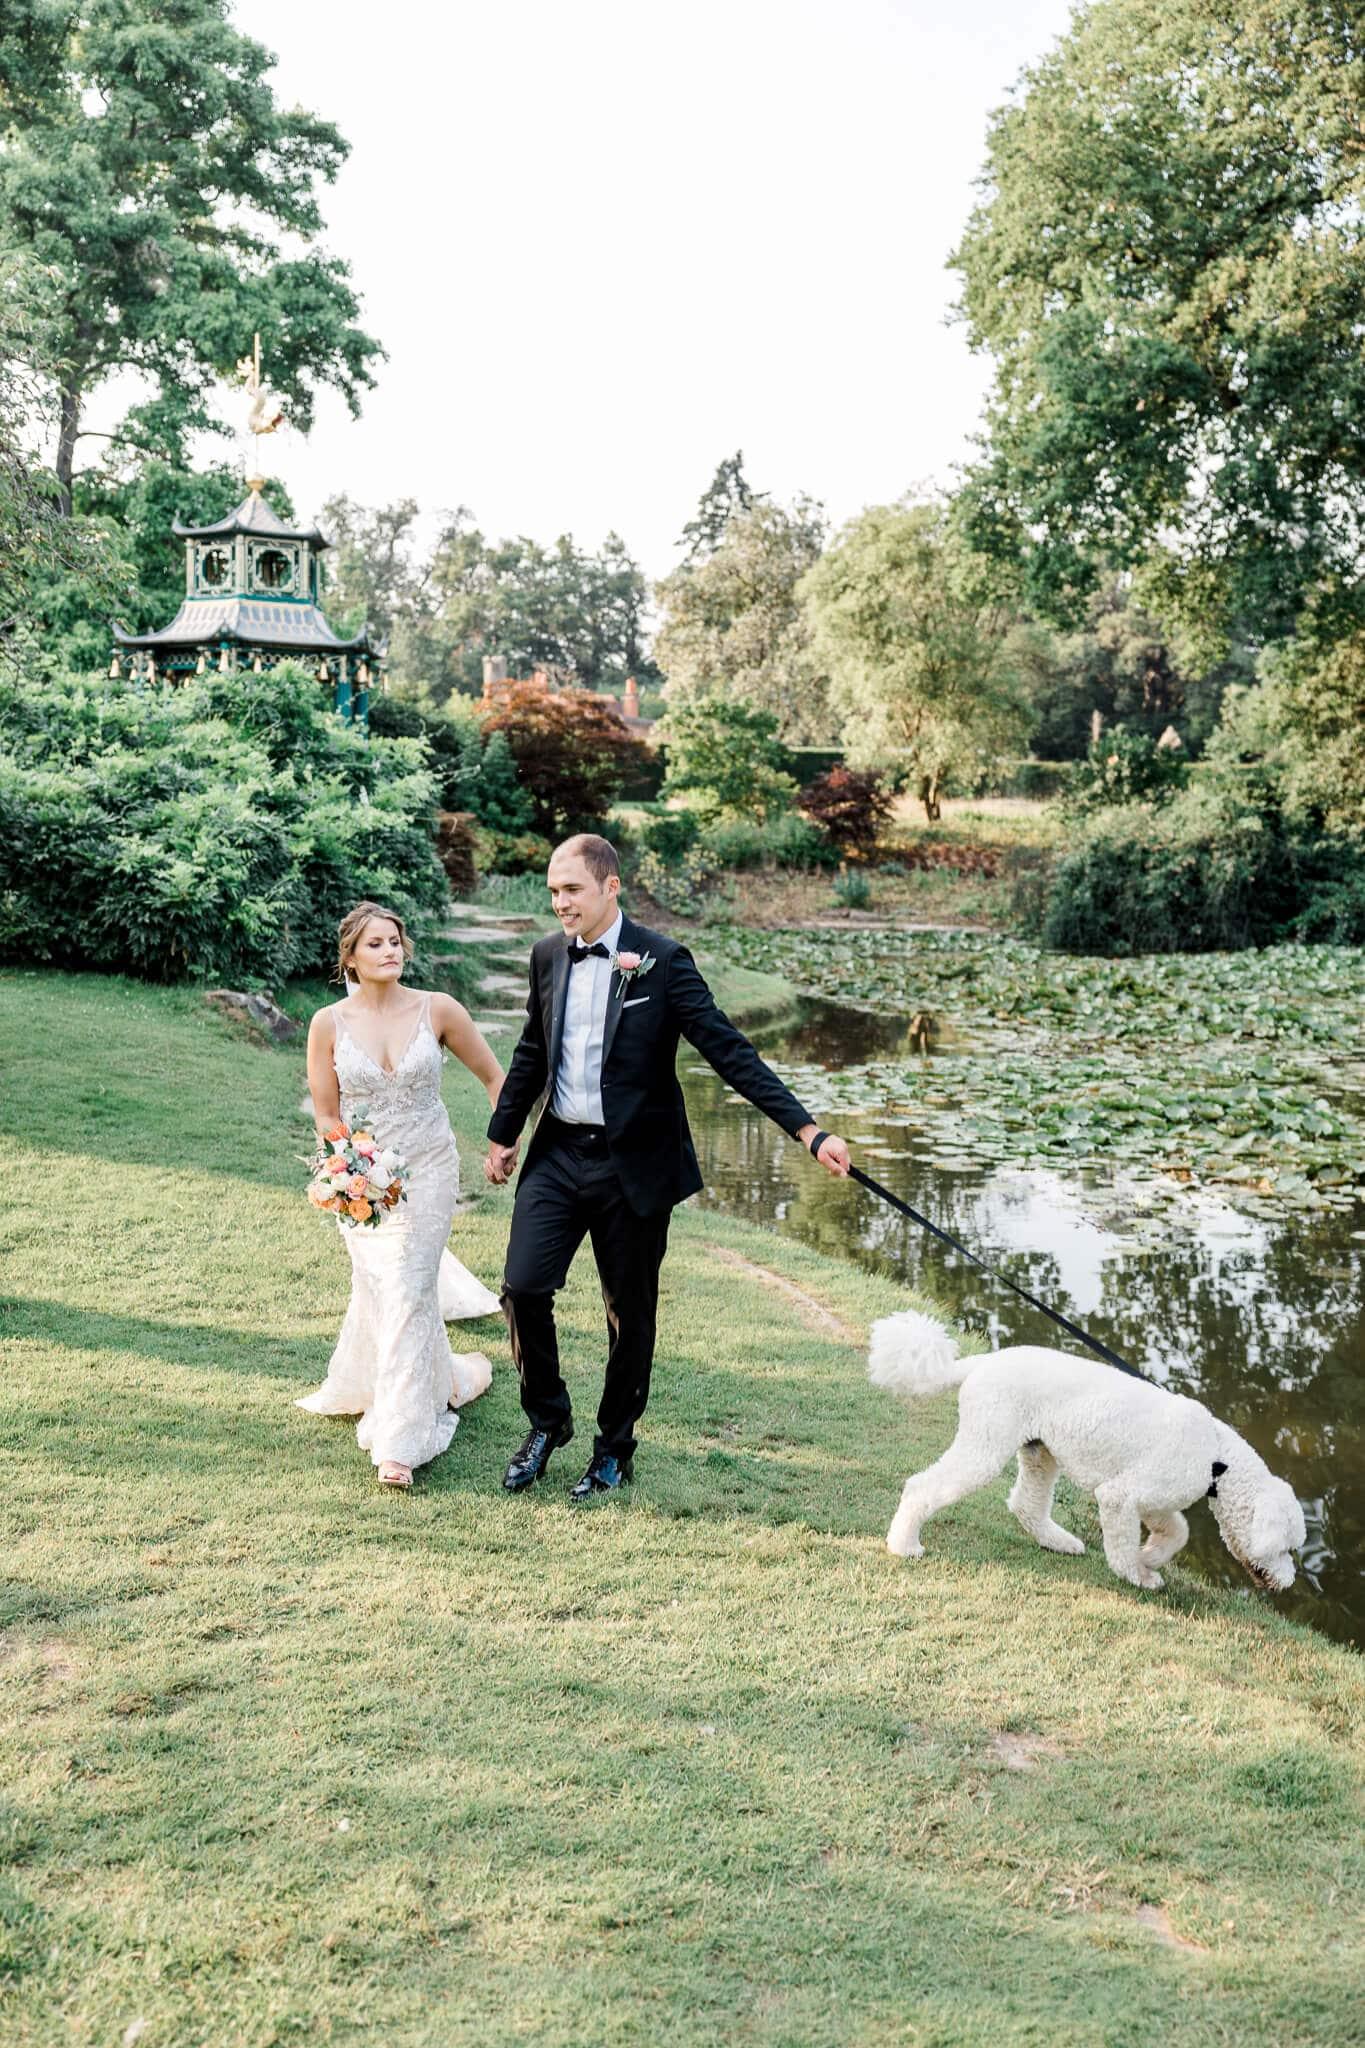 Japanese Garden wedding photography at Cliveden House | Berkshire weddings